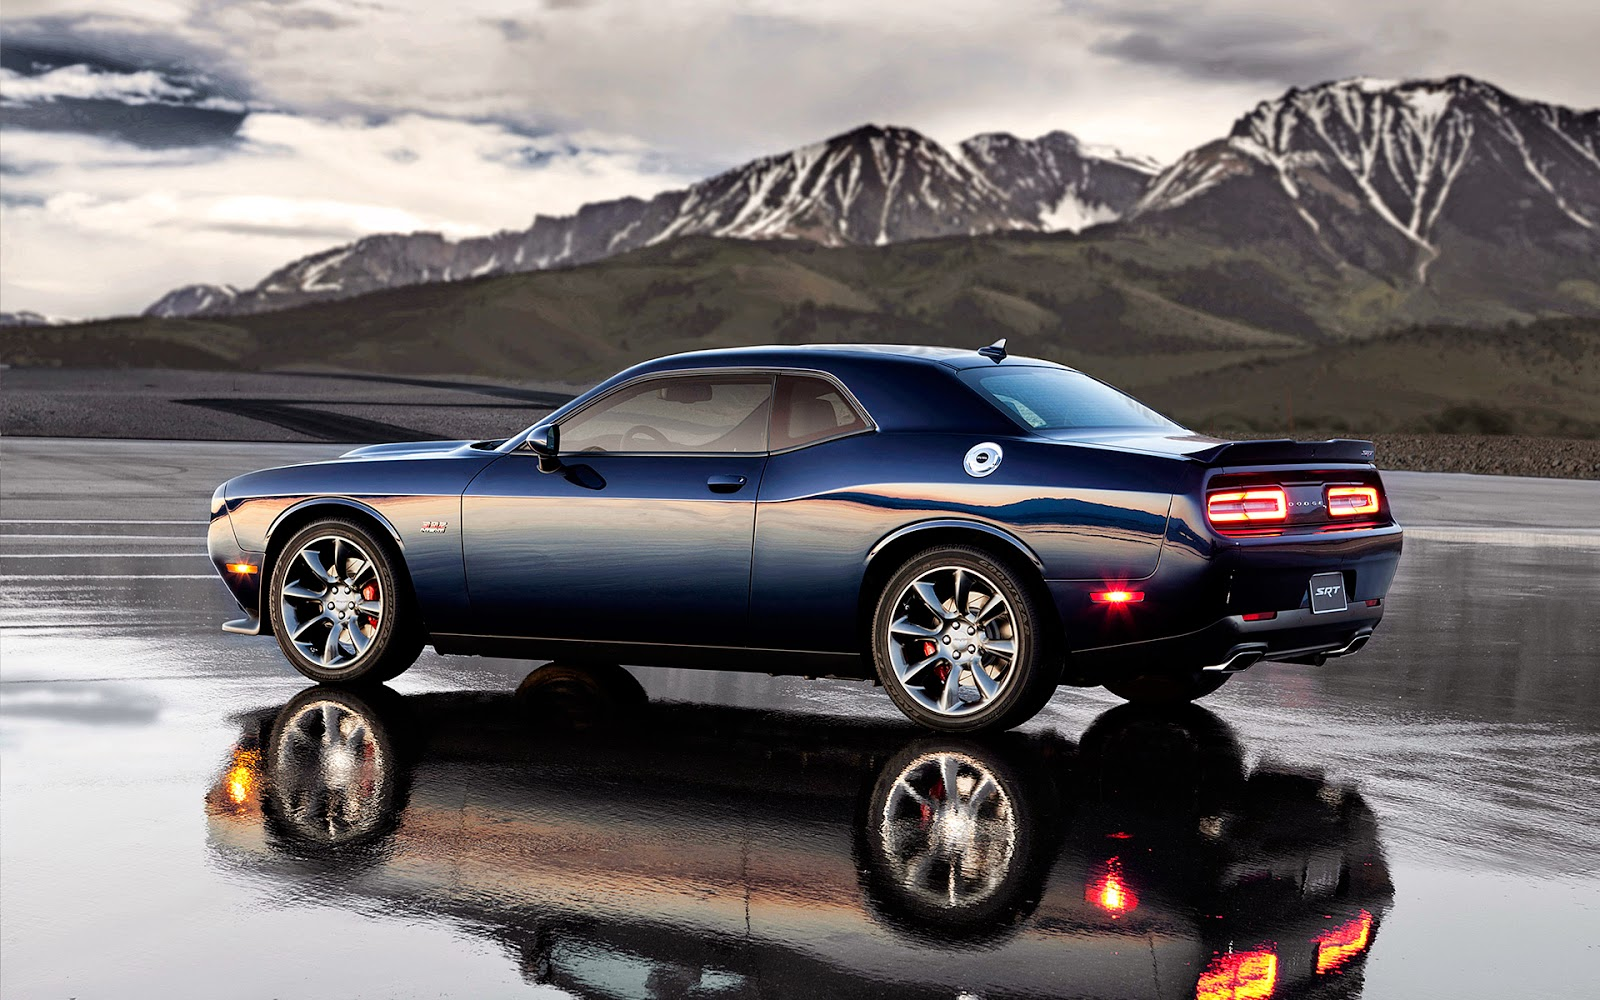 2016-cadillac-cts_100528431_h Infiniti Acura Lexus